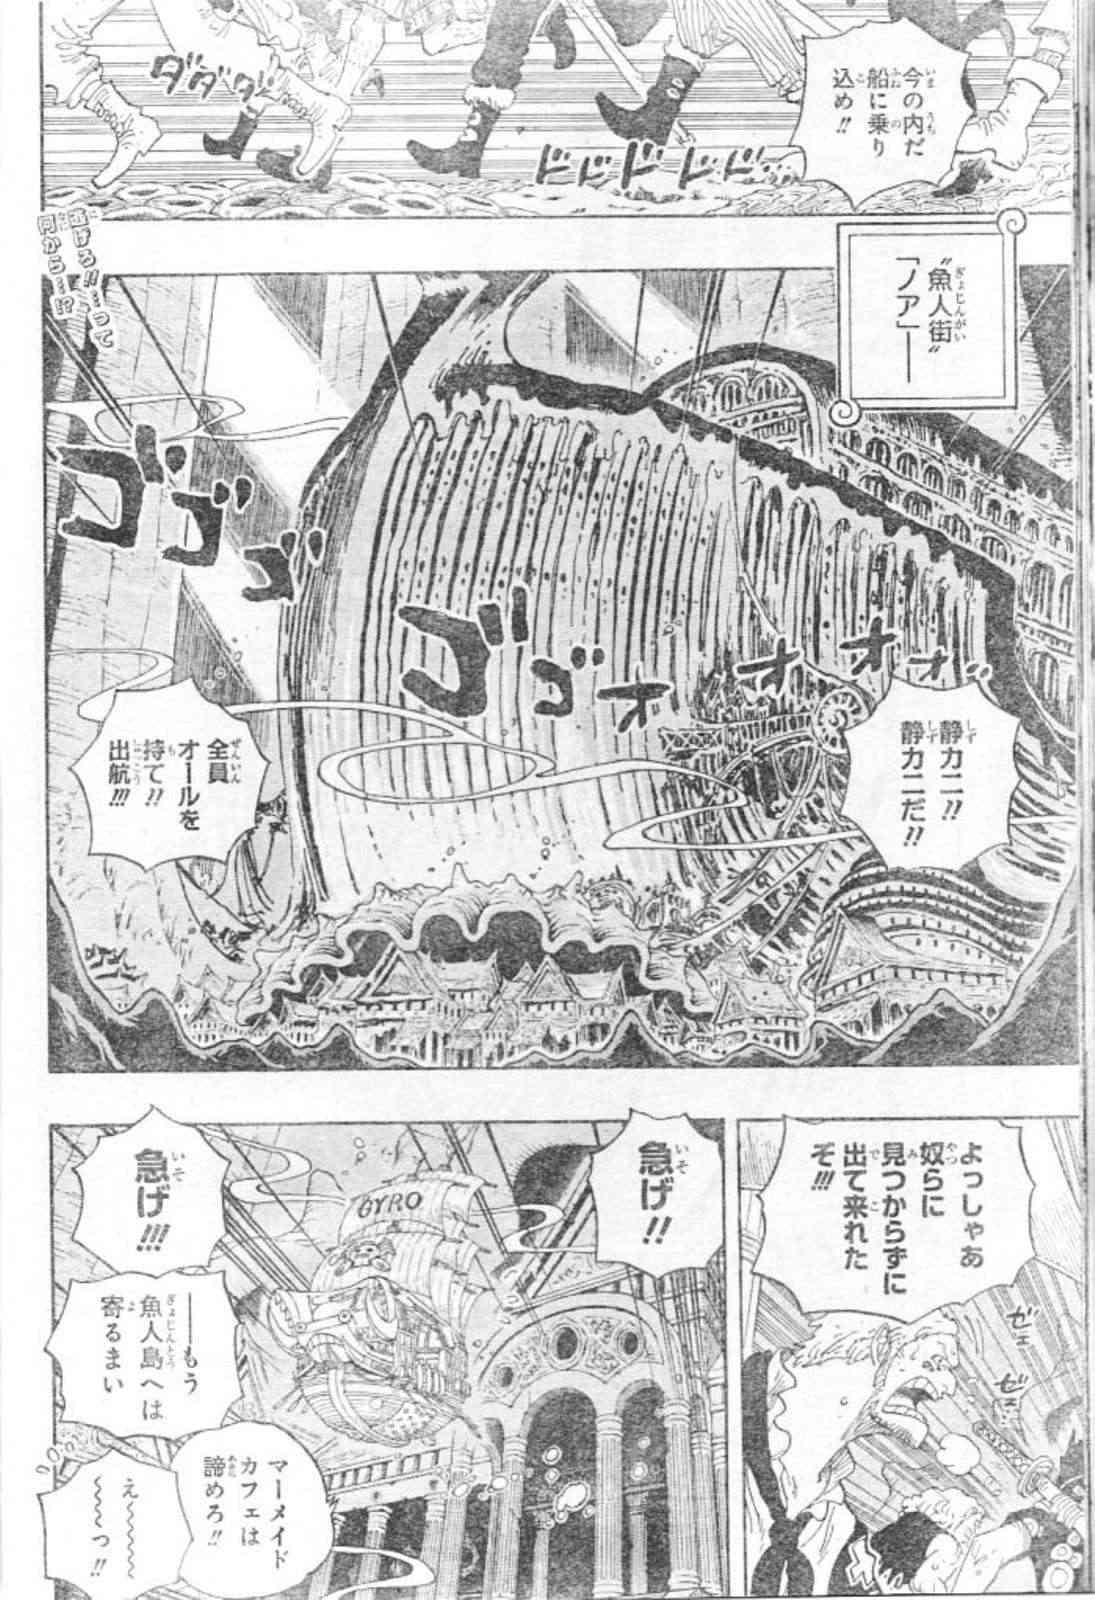 One Piece Manga 611 Spoiler Pics 02_raw10